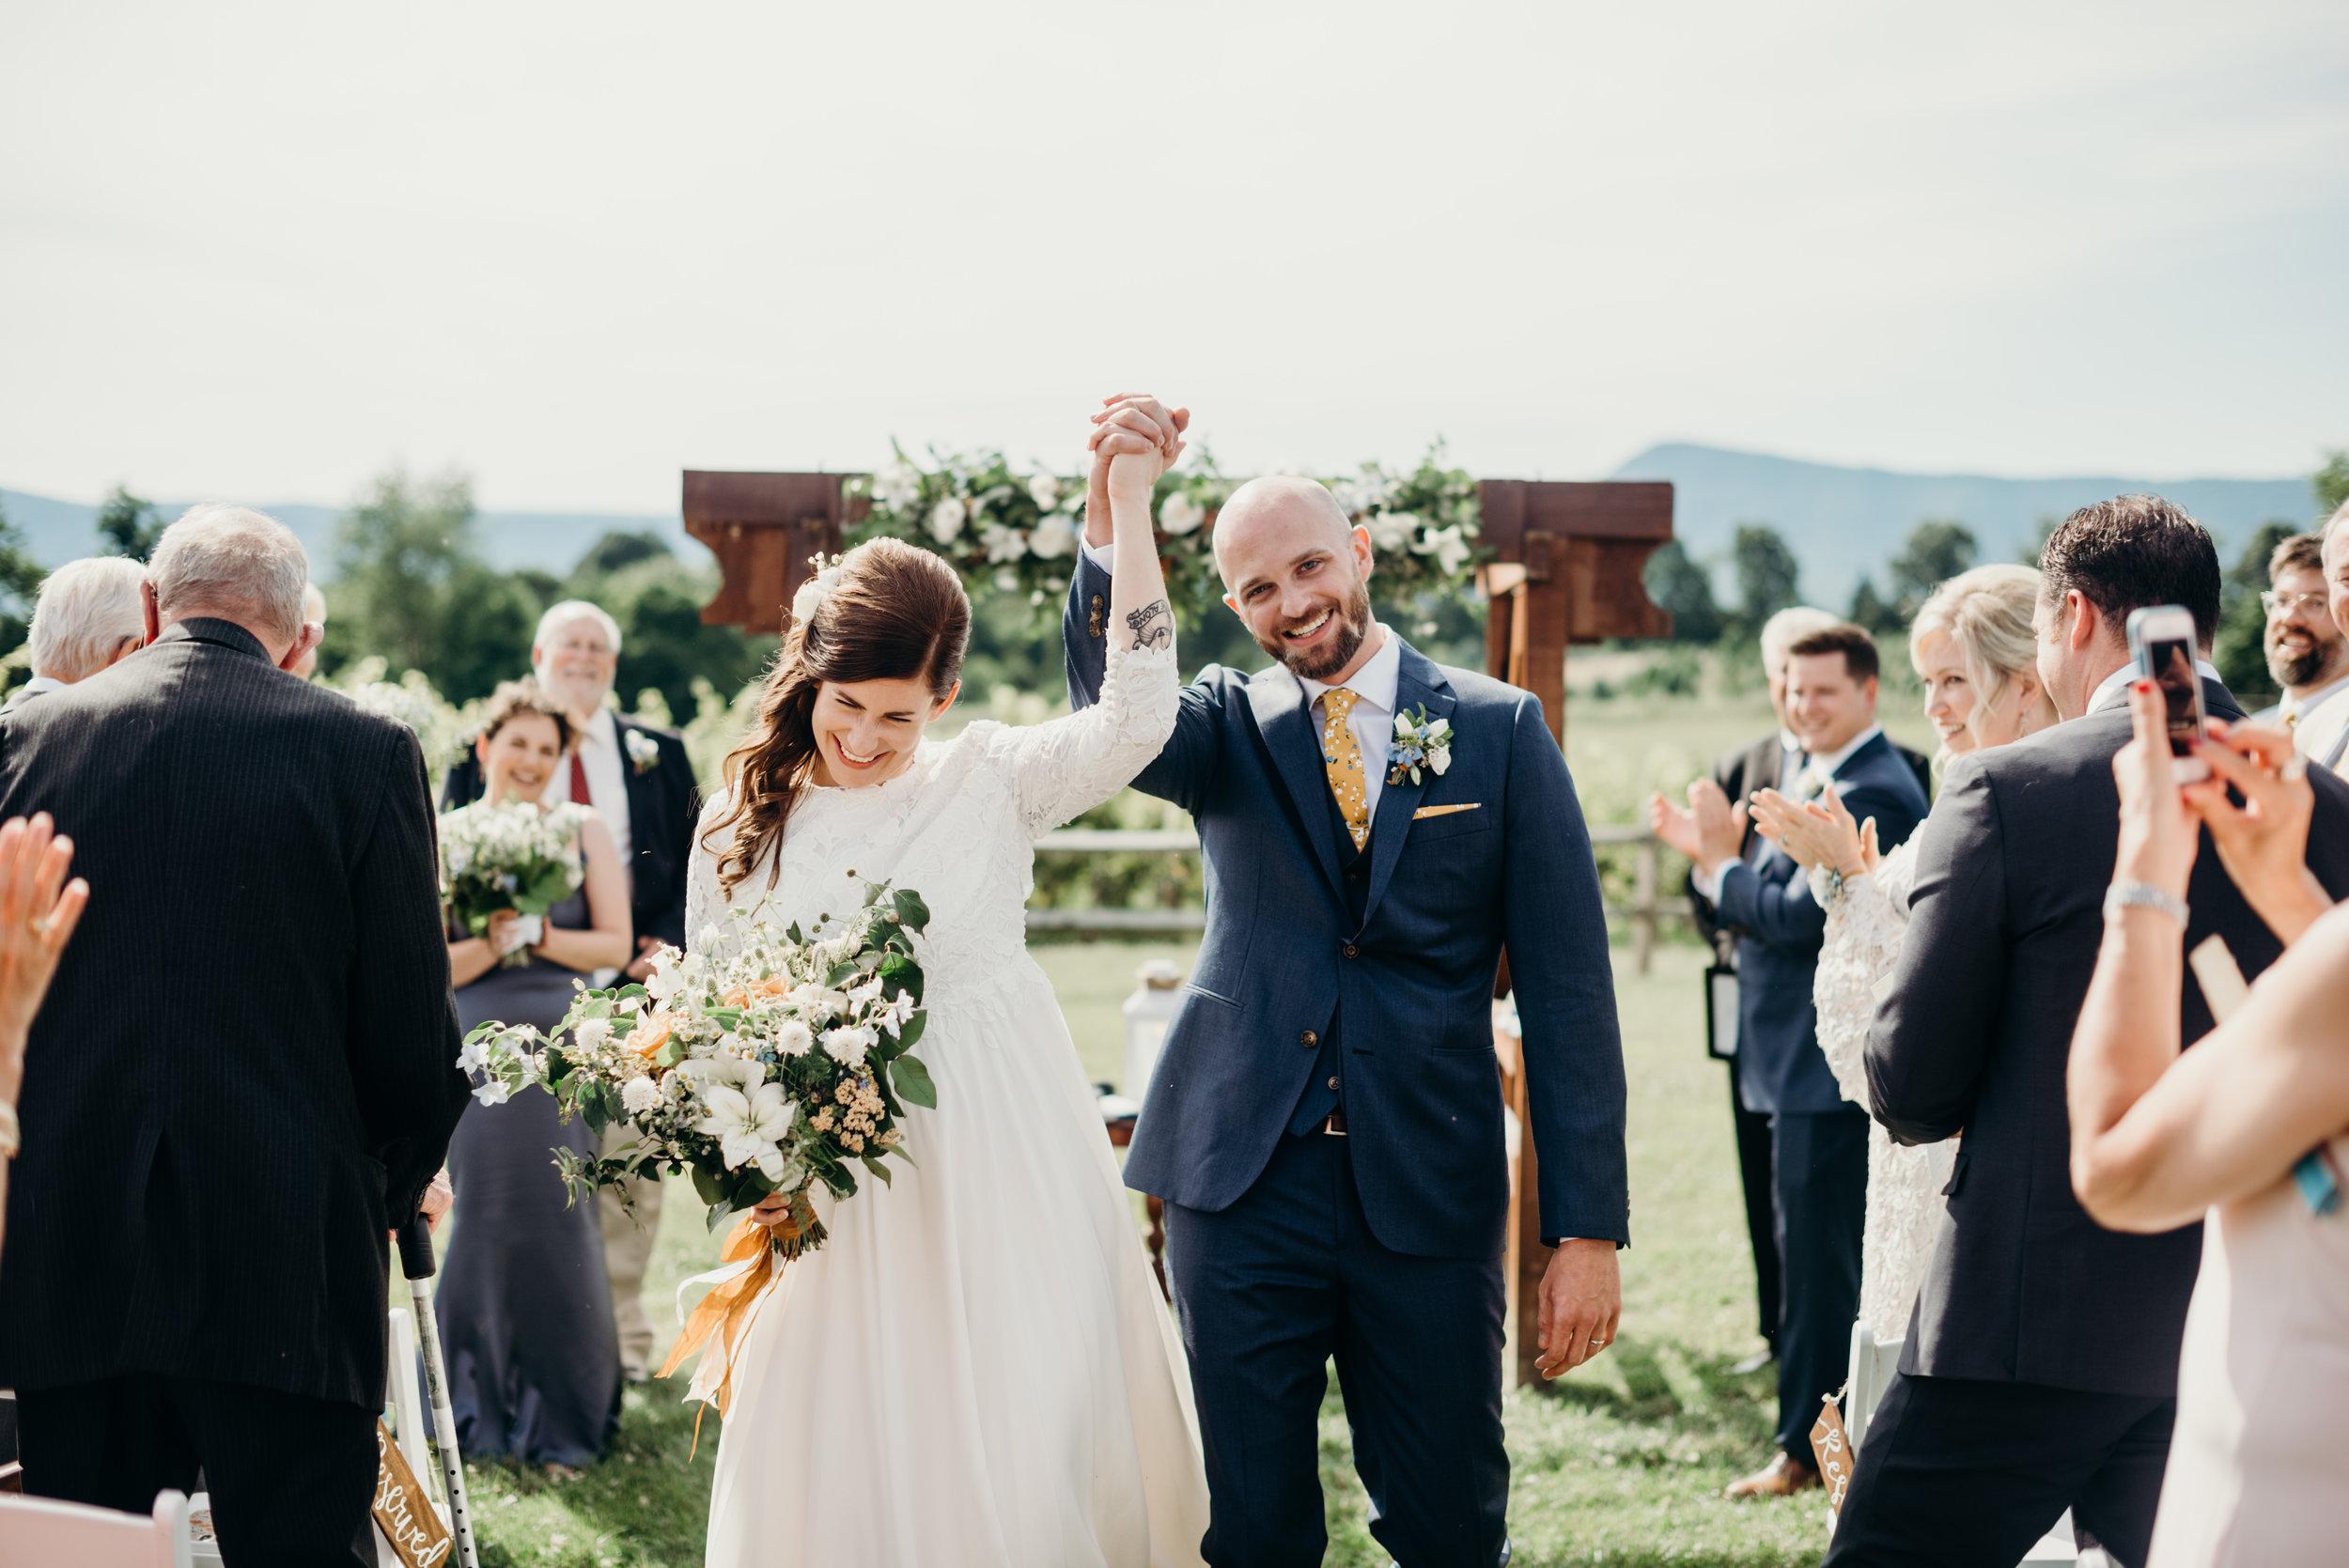 faithbrooke-barn-vineyards-wedding-shenadoah-virginia